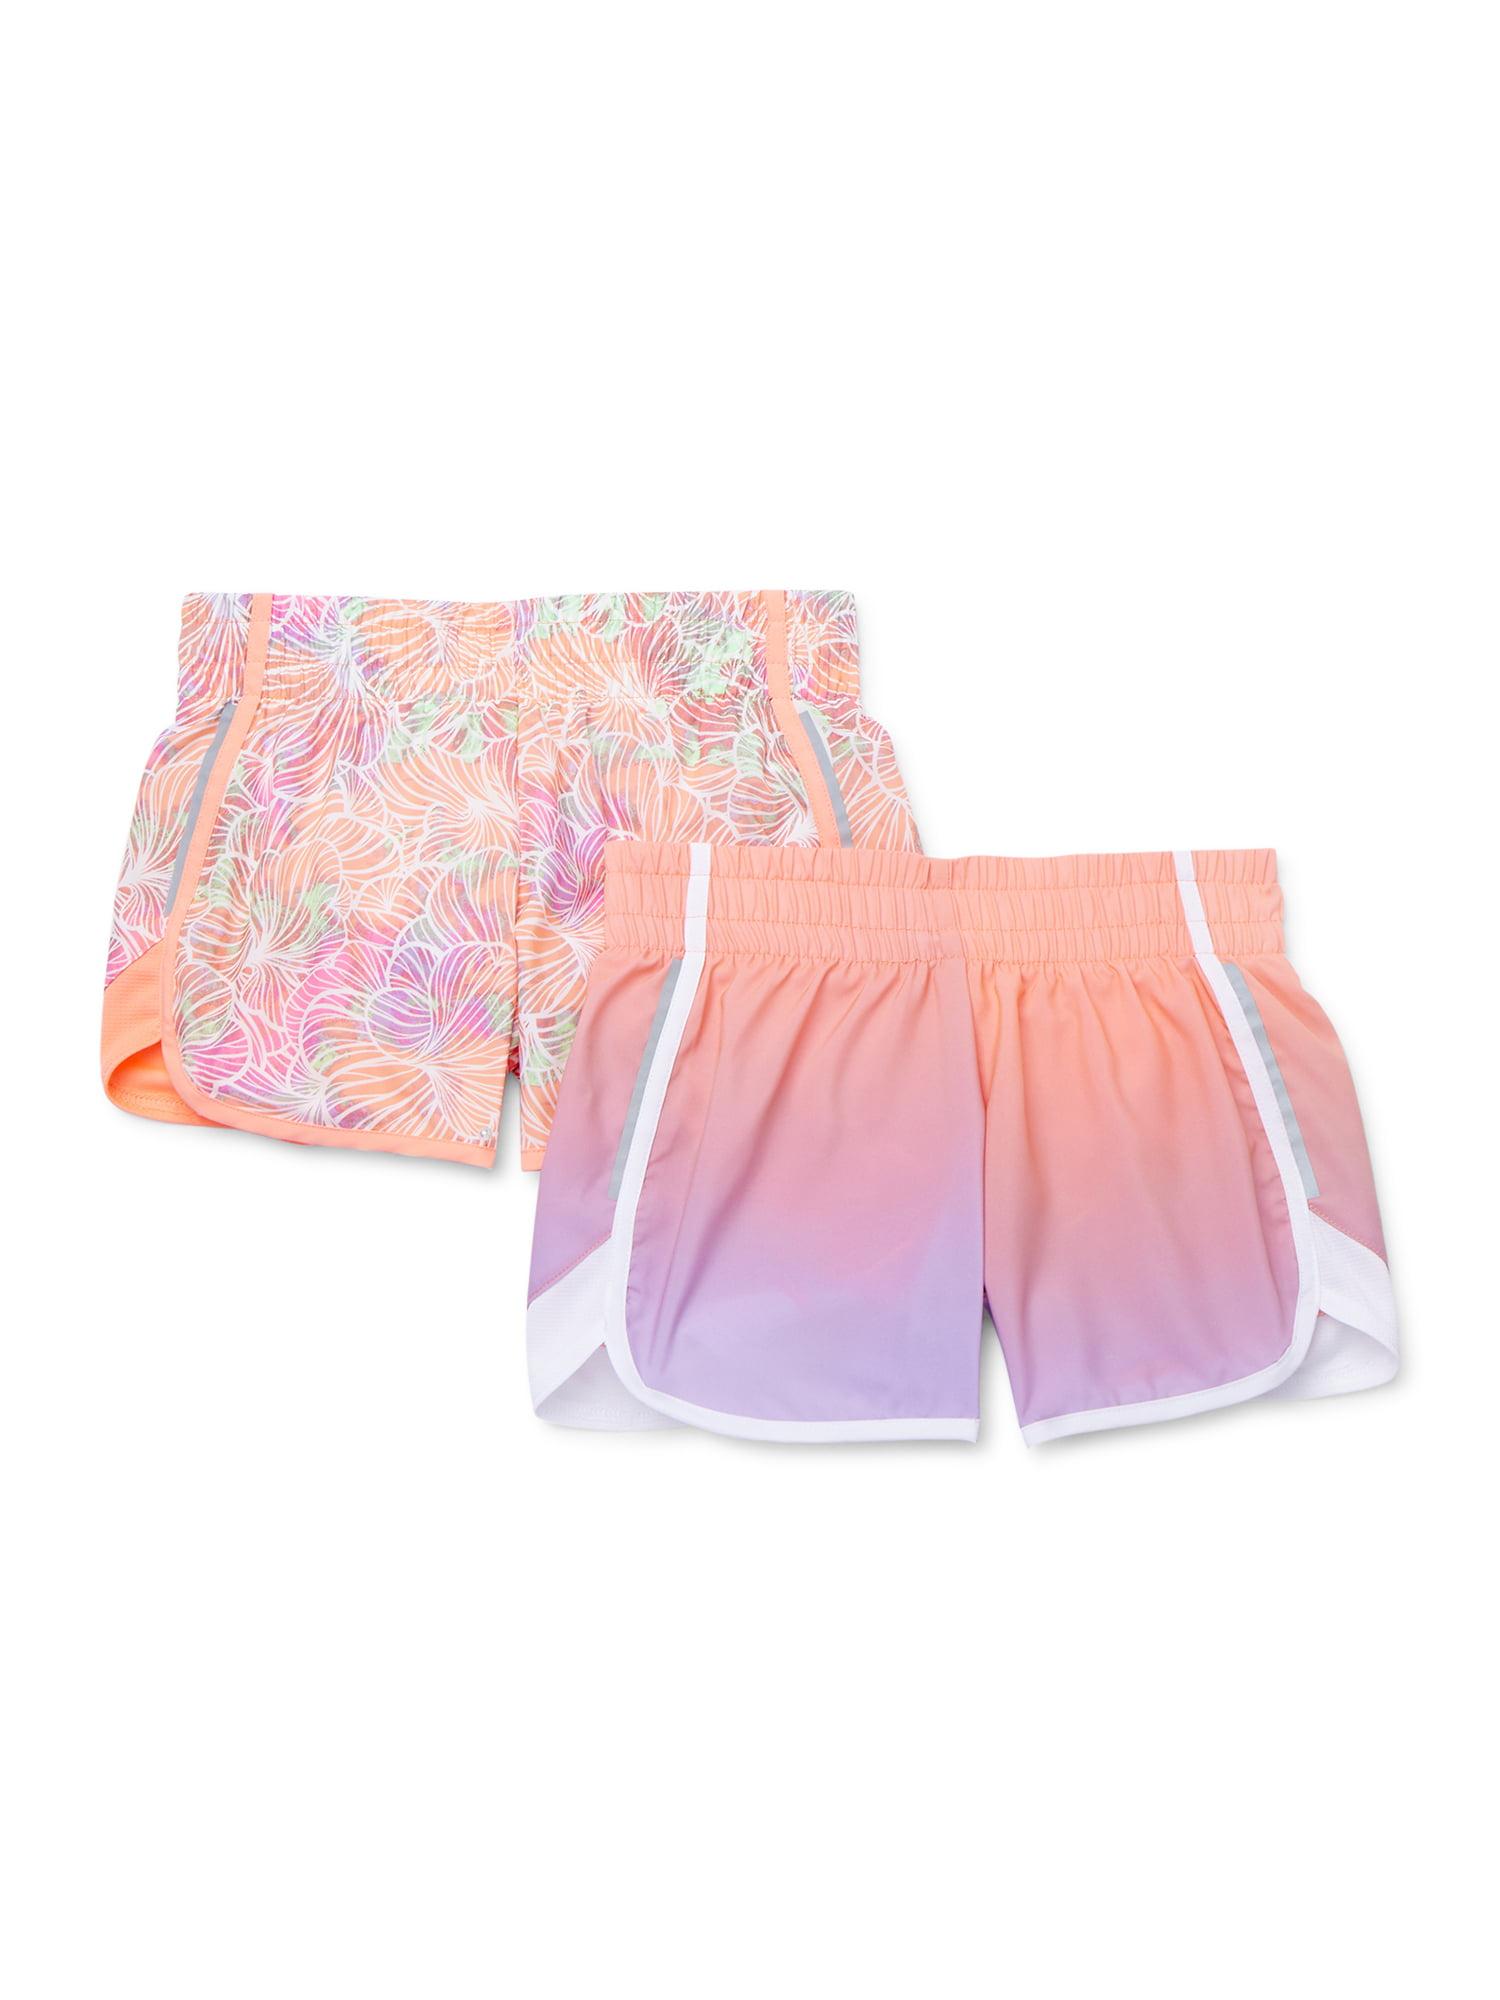 Essentials Girls 2-pack Active Running Shorts